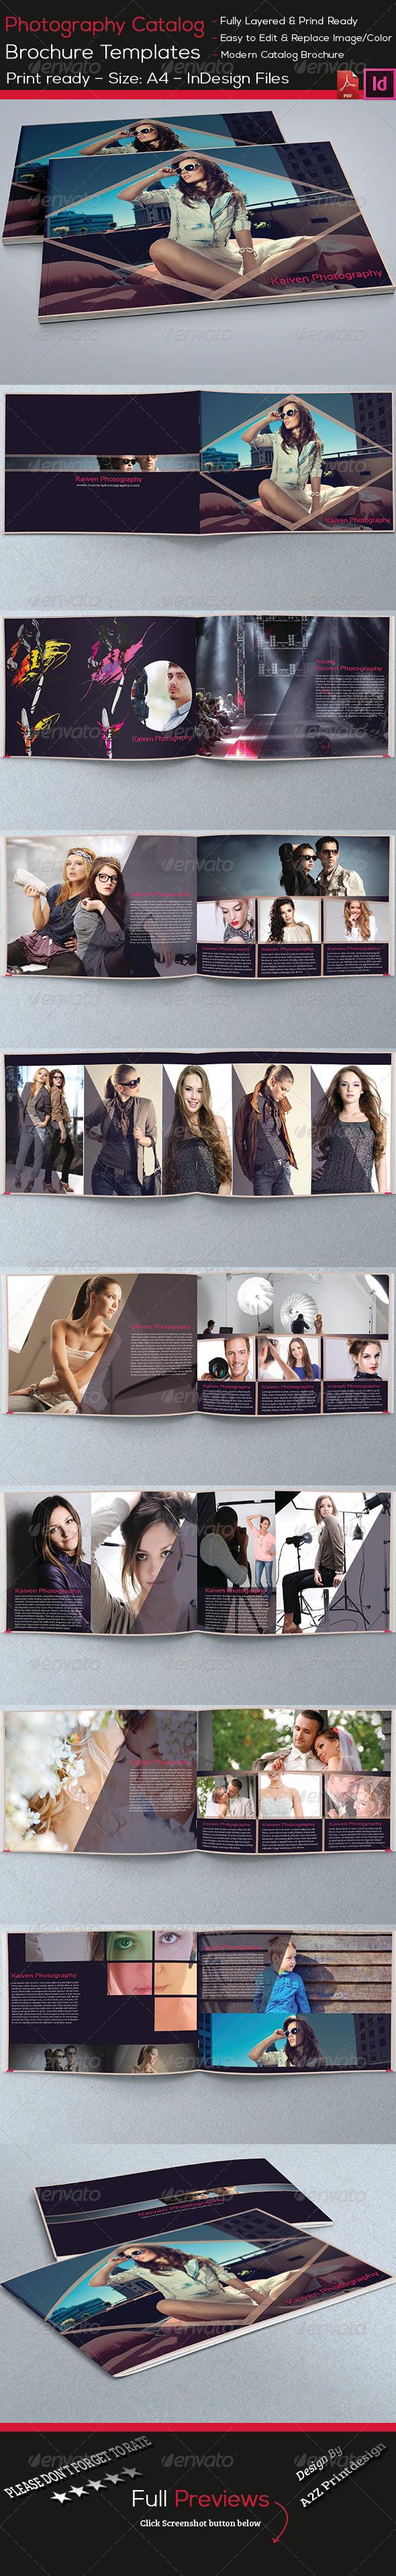 GraphicRiver Photography Catalog 8423305